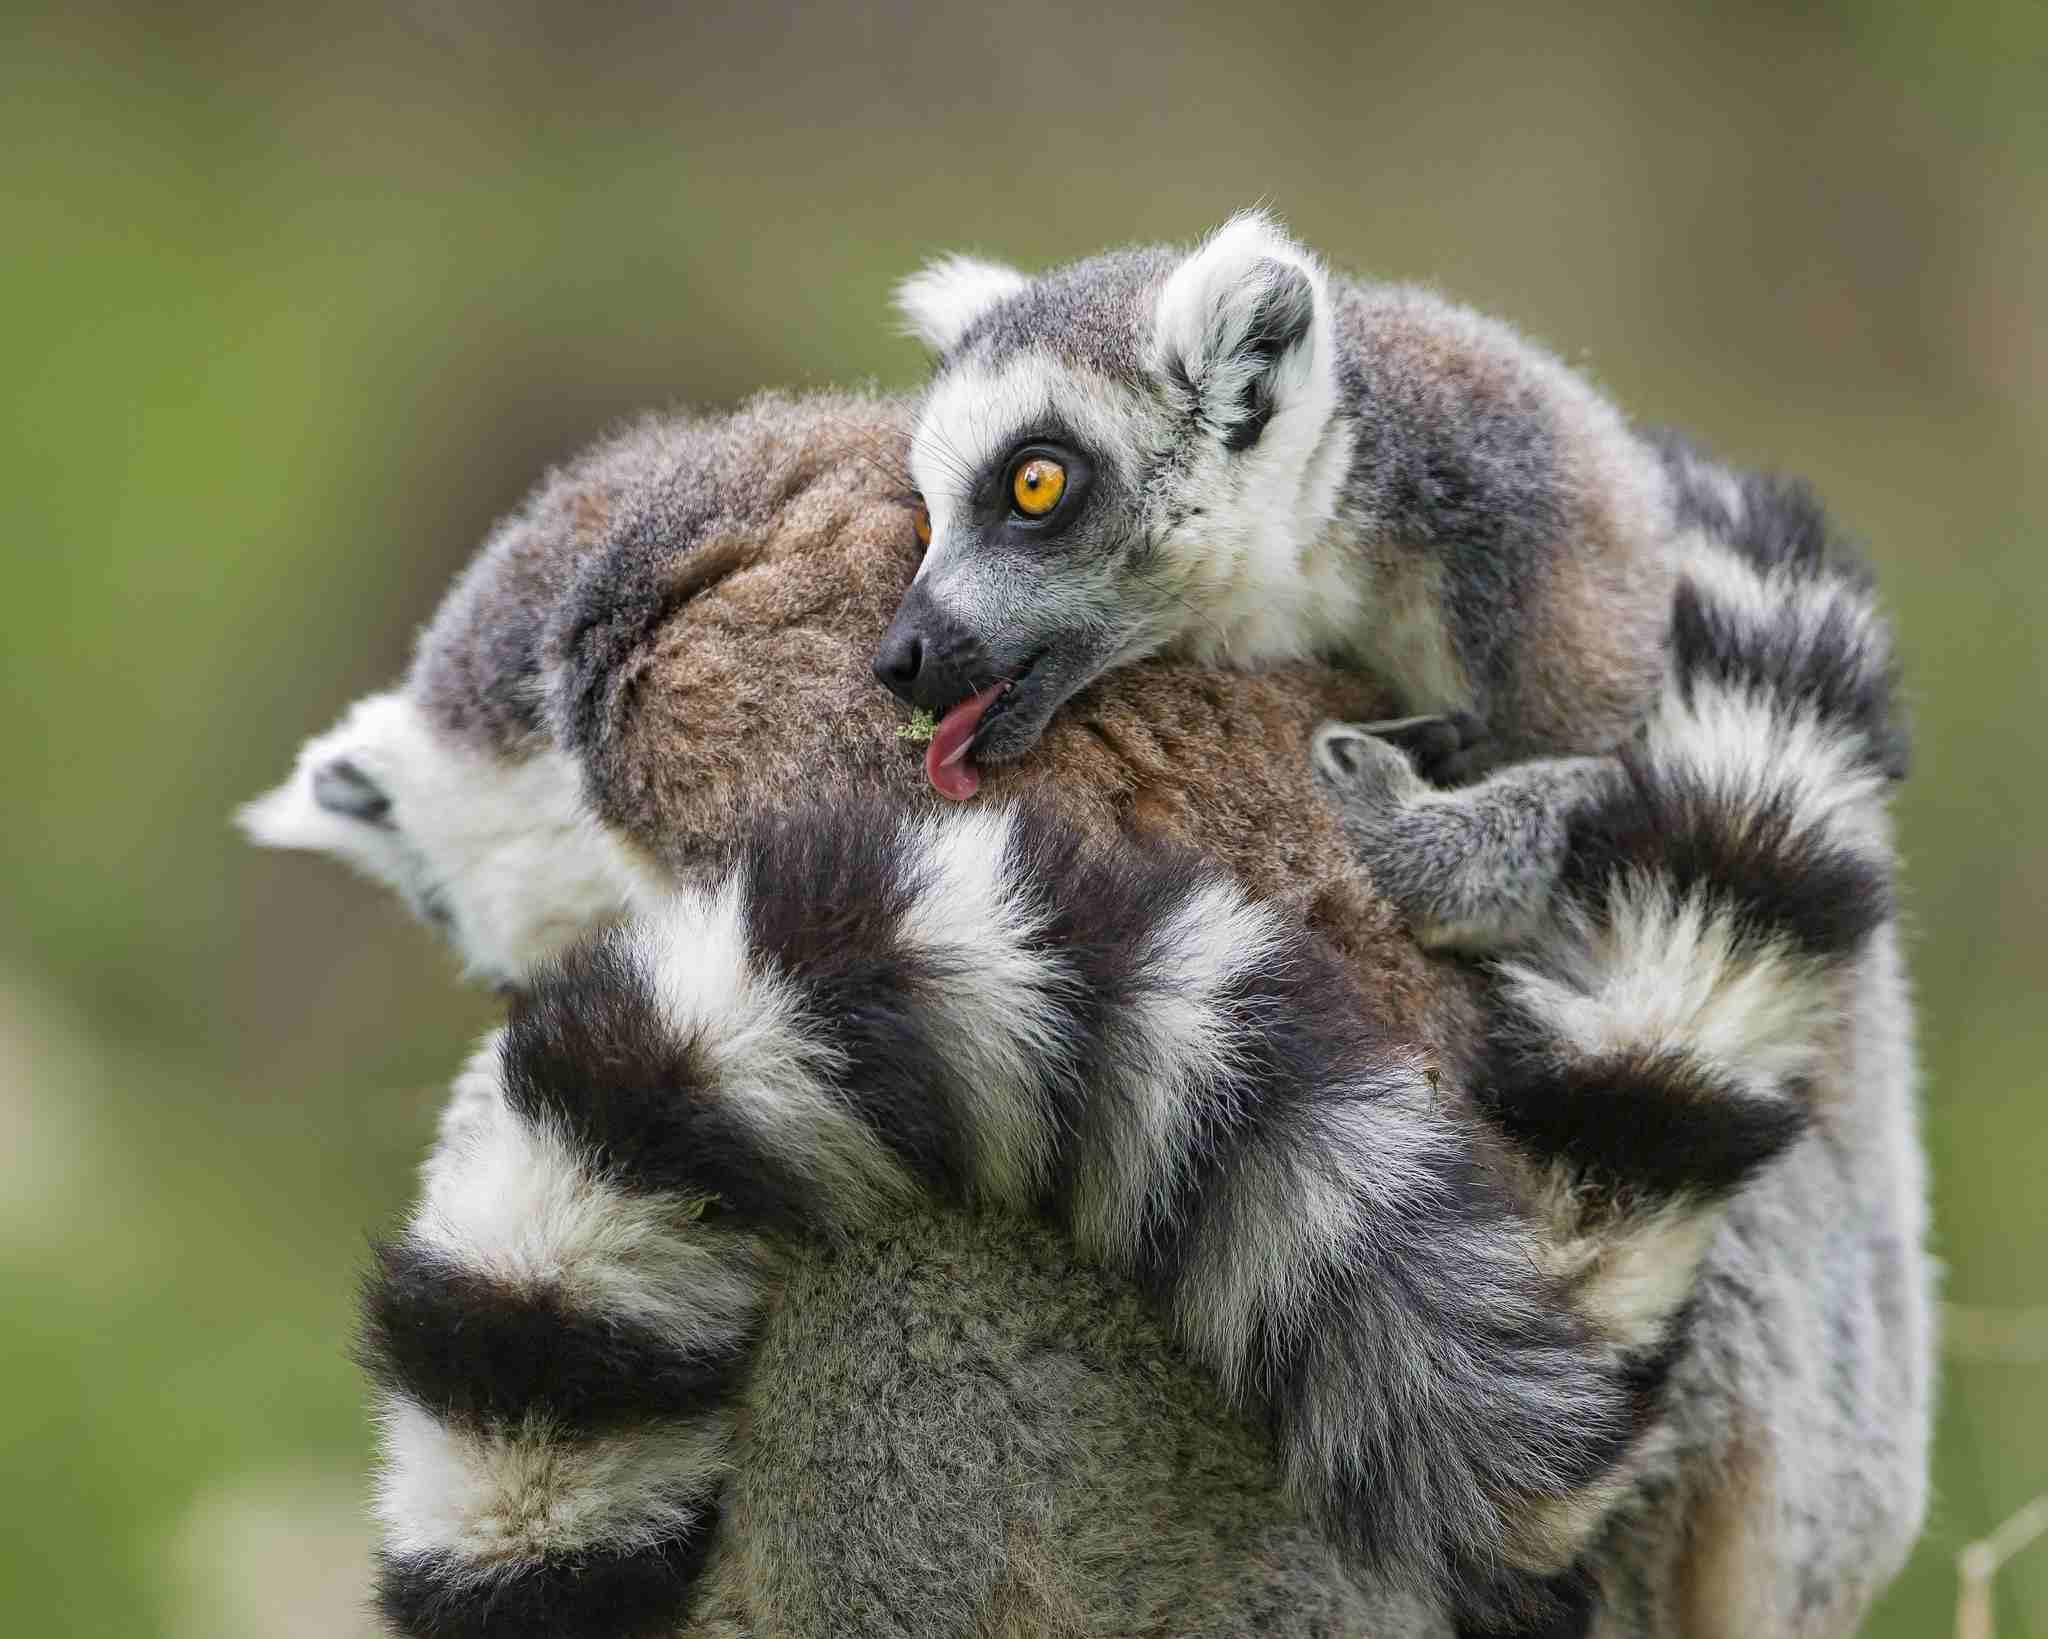 bebé lémur acicalado mamá